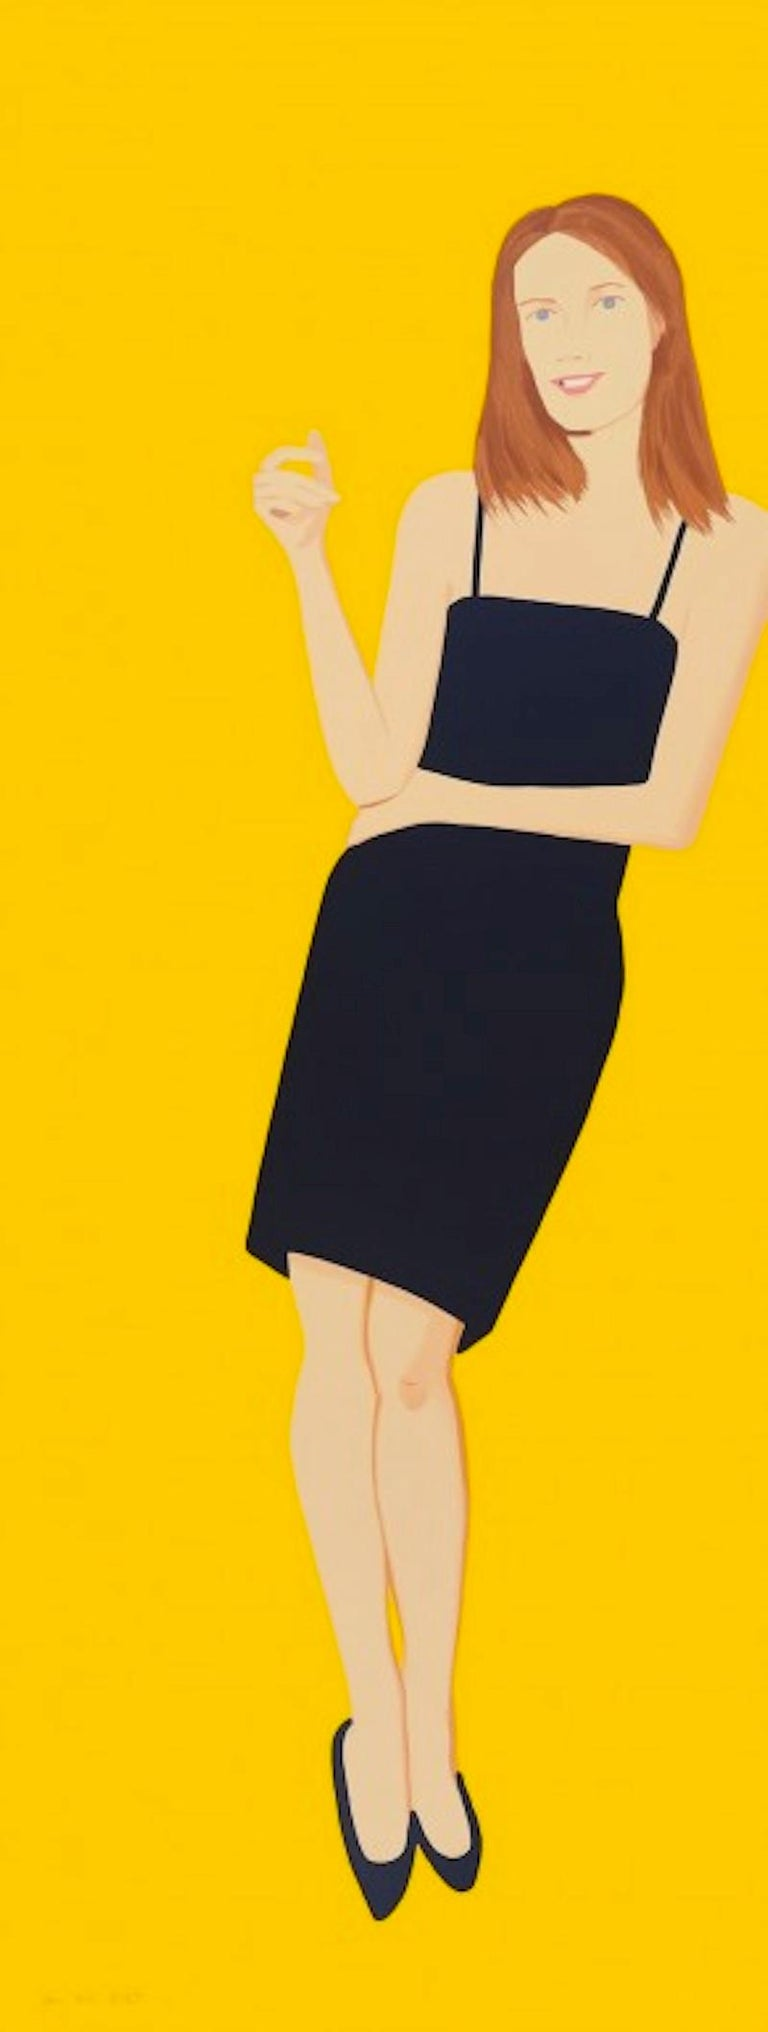 Black Dress Portfolio - Sharon - Print by Alex Katz